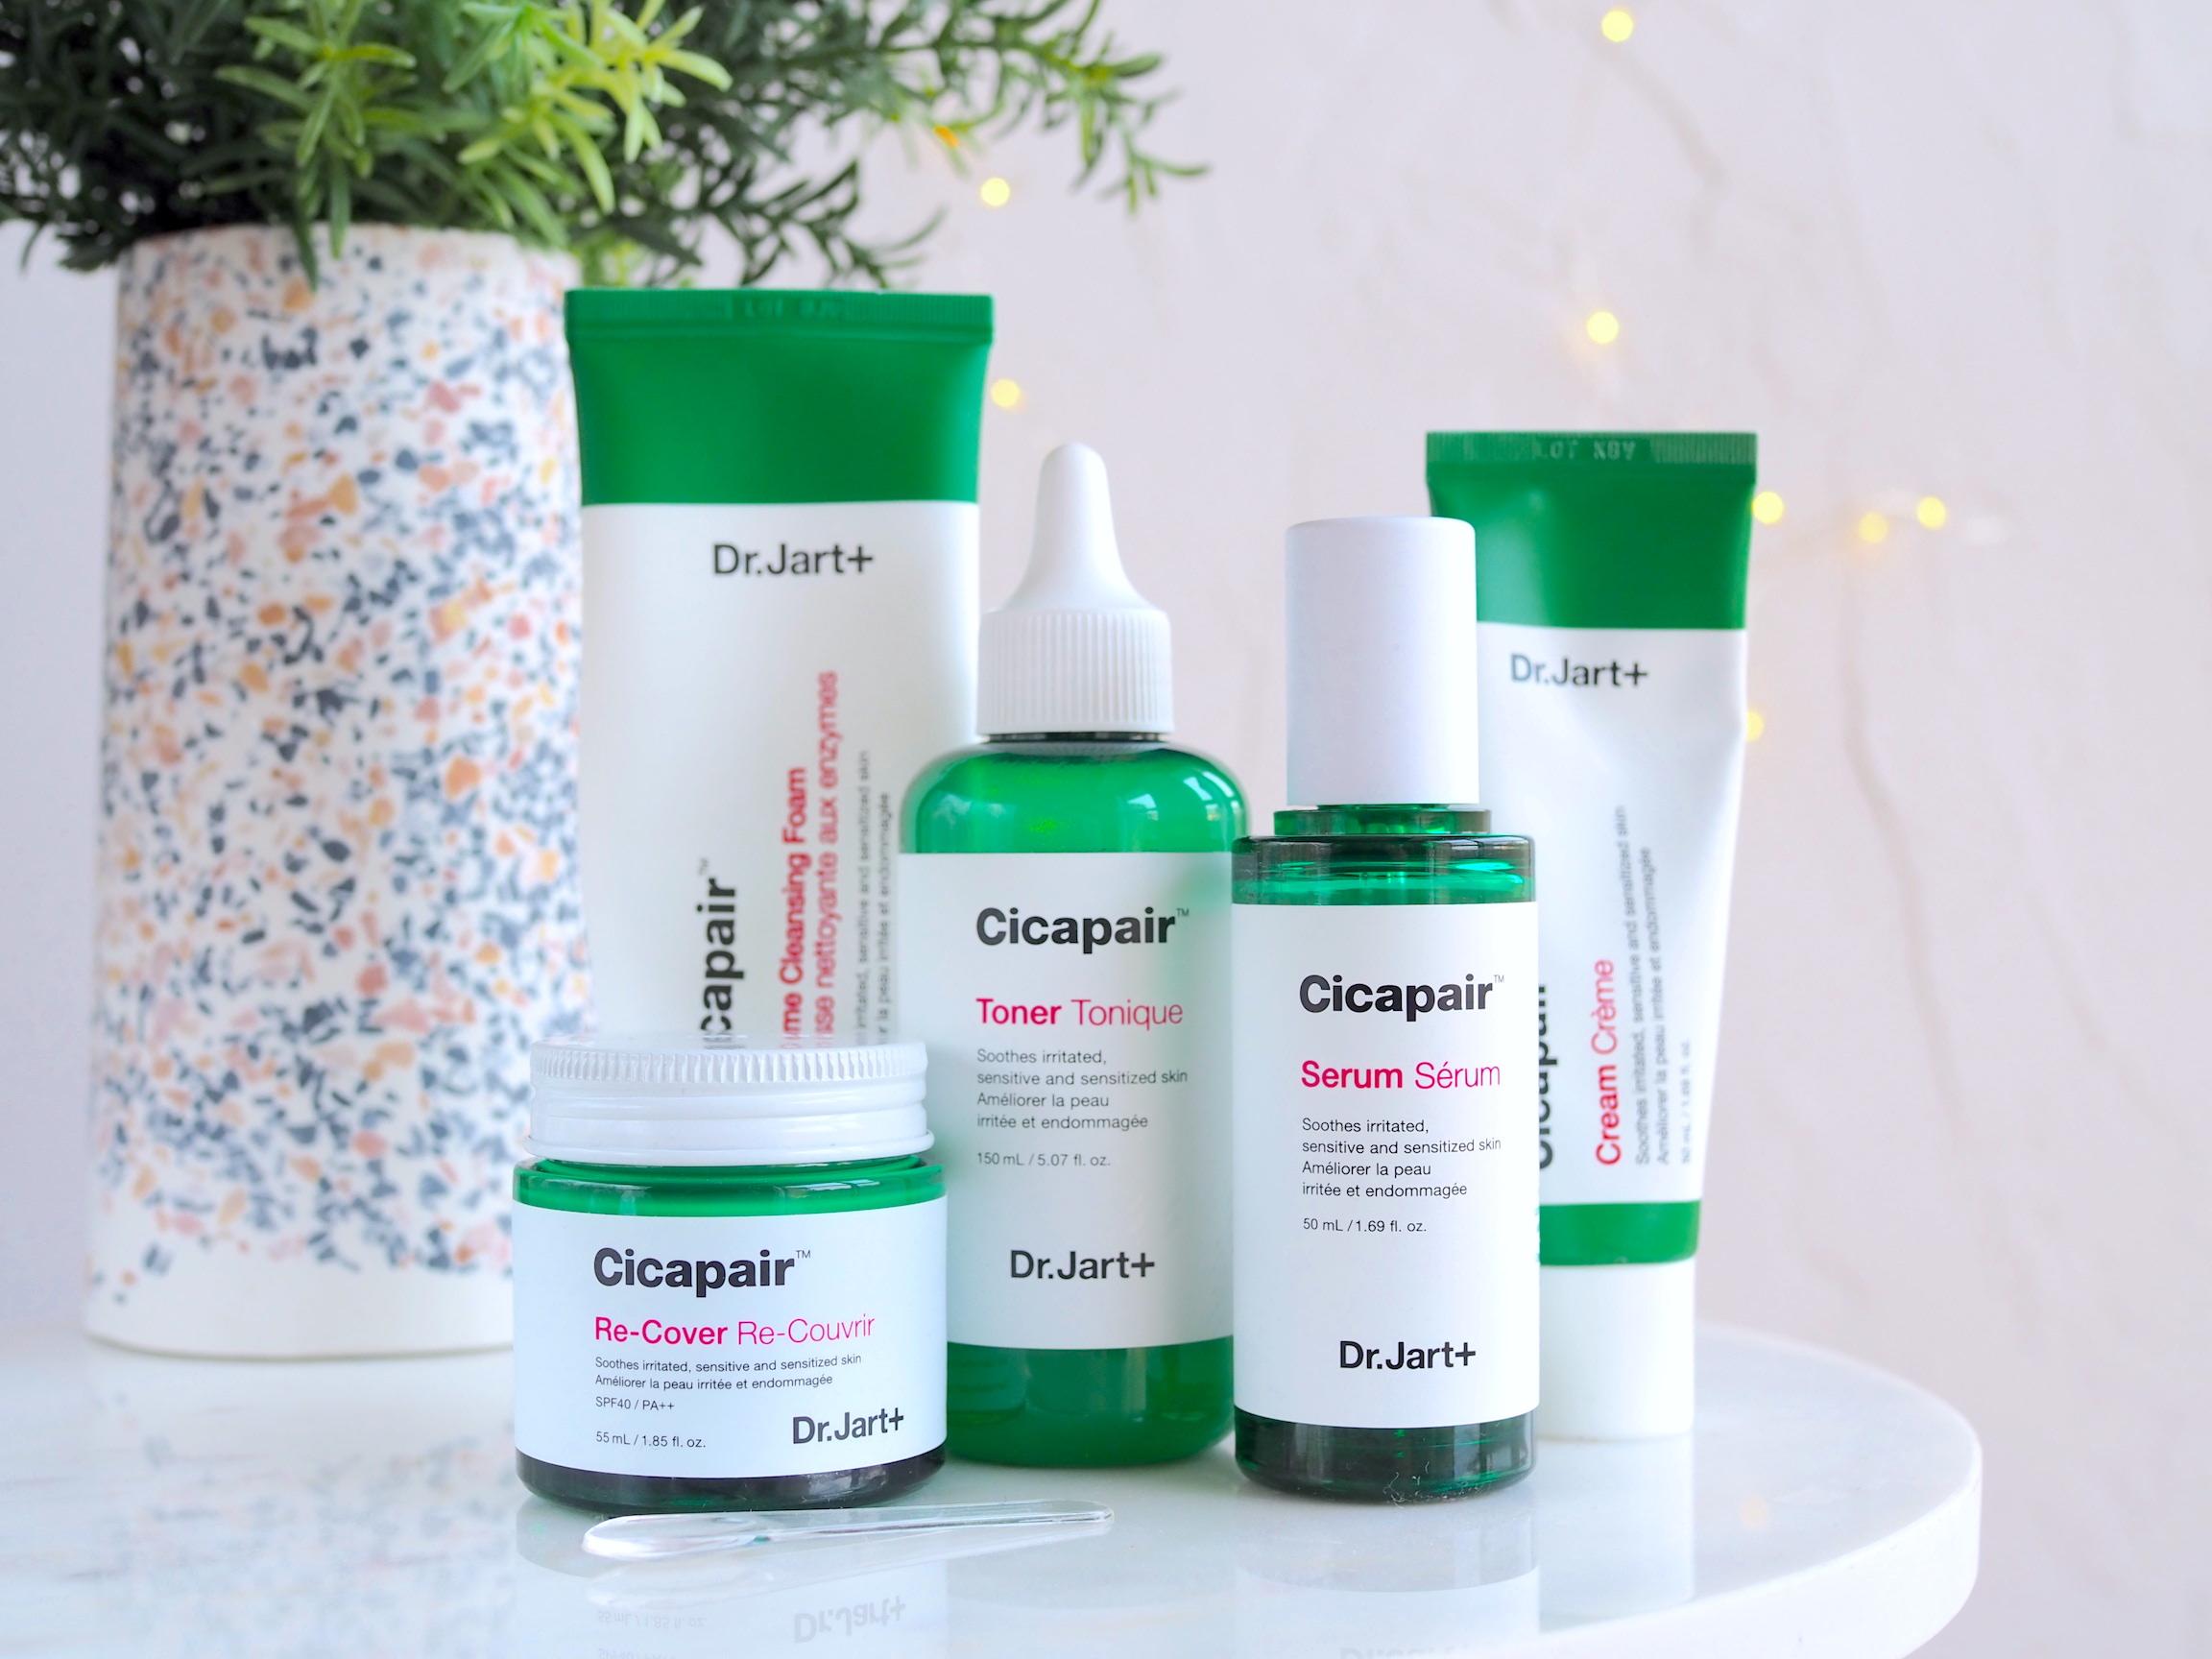 Dr.Jart+ Cicapairシリーズ